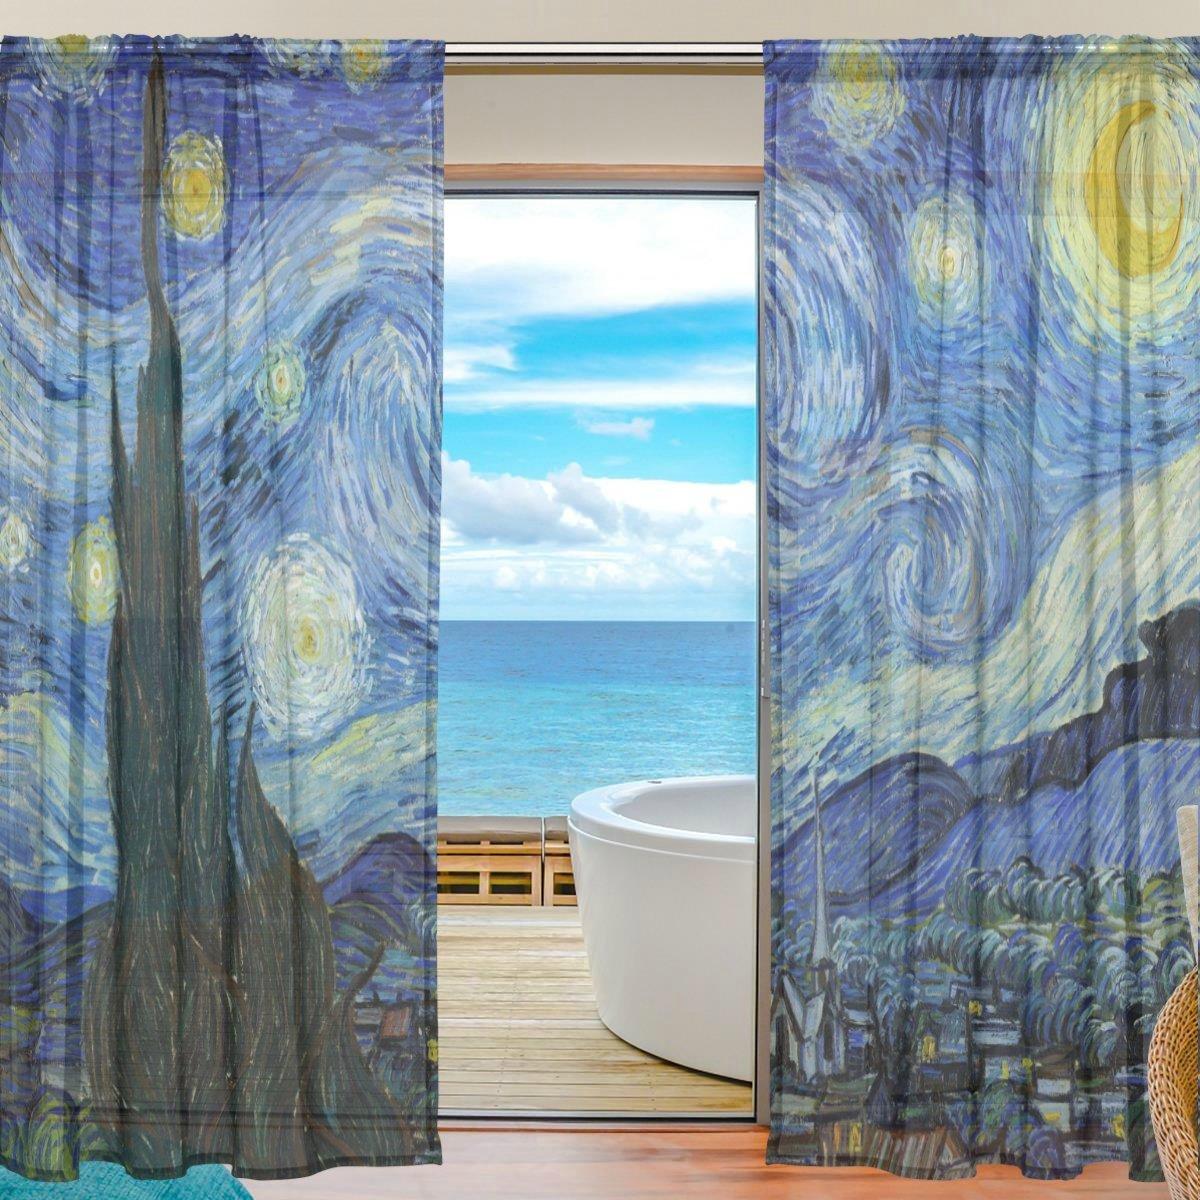 SEULIFE Window Curtain Kitchen Bedroom